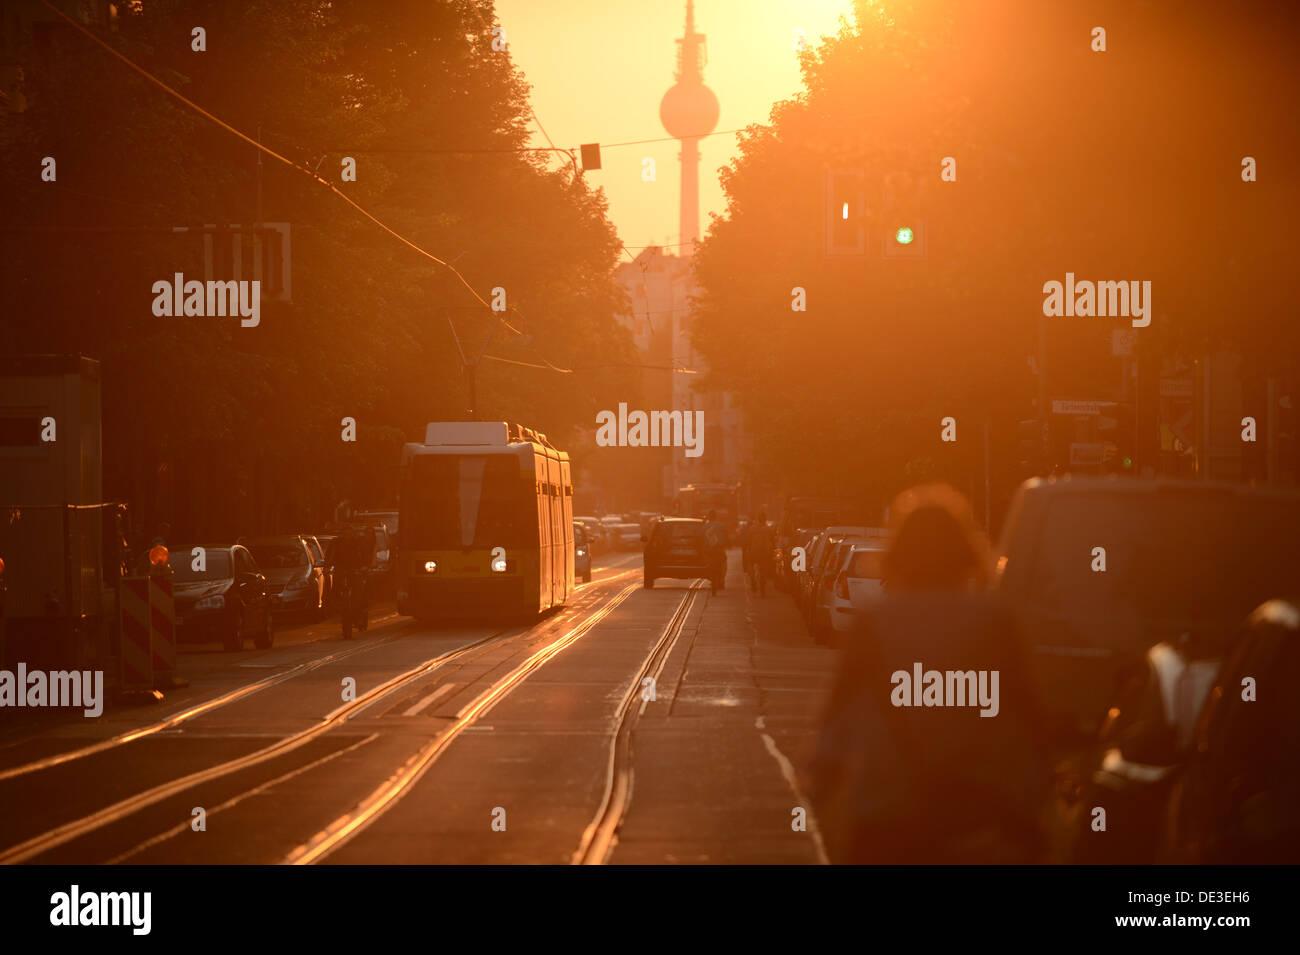 Berlin, Germany, a tram in the Wühlischstrasse in Friedrichshain- Kreuzberg - Stock Image